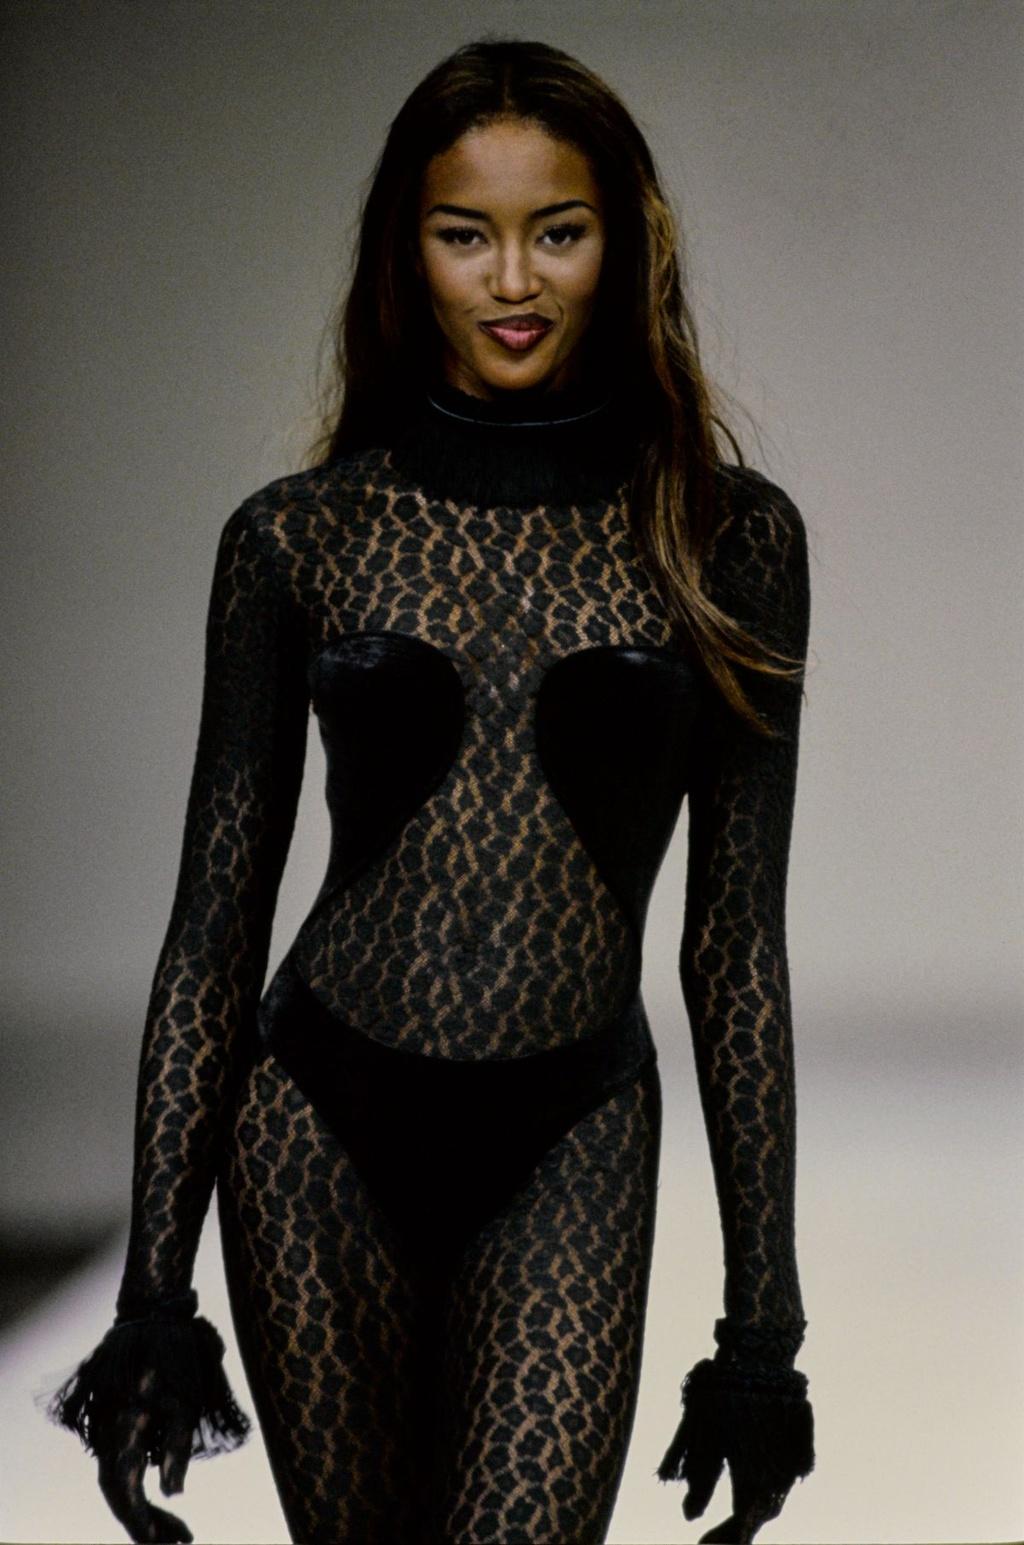 Kylie Jenner ra dang doanh nhan trong bo suit tri gia 153 trieu dong hinh anh 12